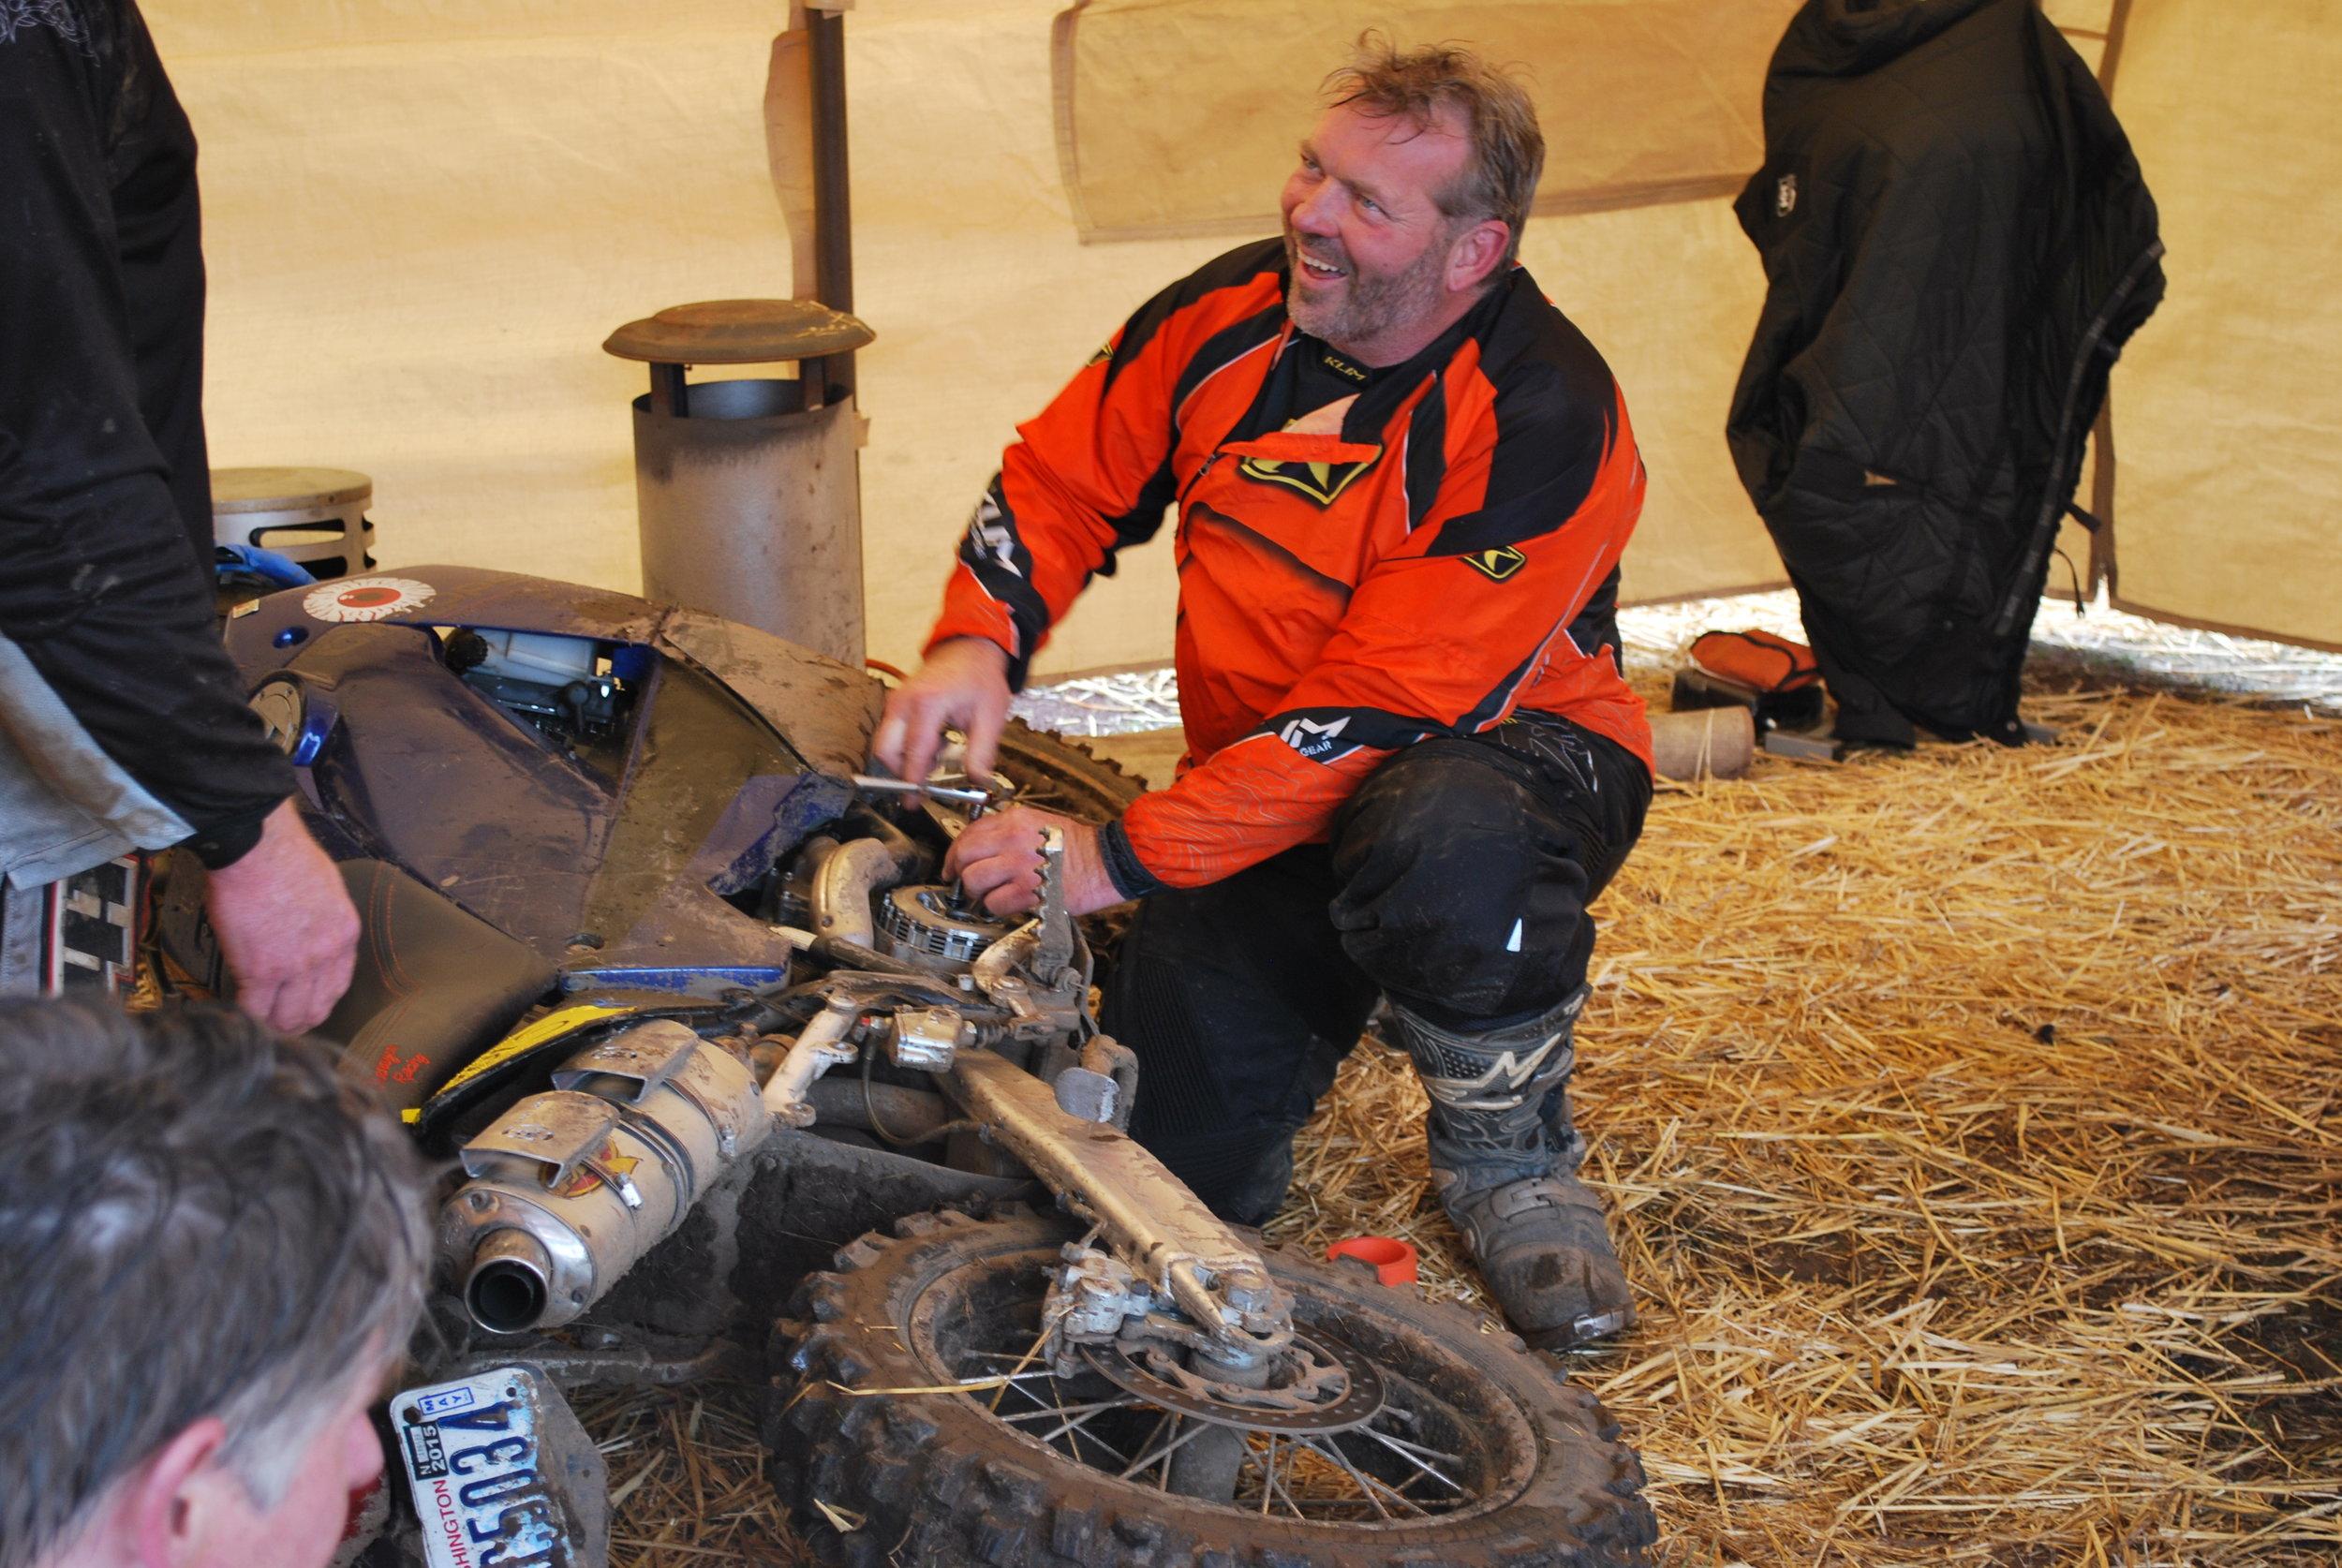 Darryl-VanNieuwenhuise-Cyclops-TPMS-Adventure-Rider-Radio-Motorcycle-Podcast-3.JPG